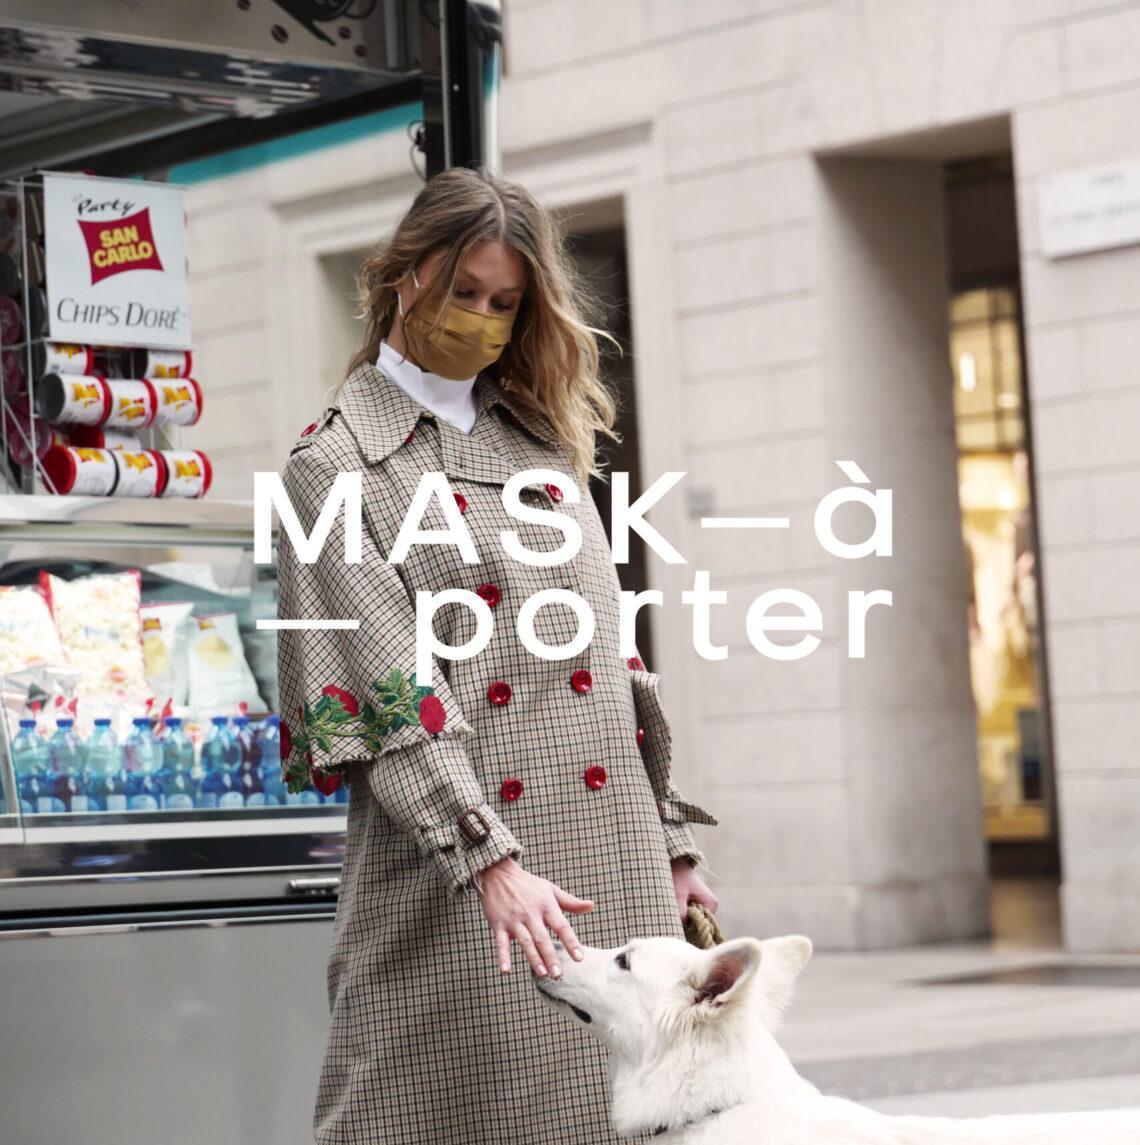 MASK-À-PORTER MASCHERINA 2020